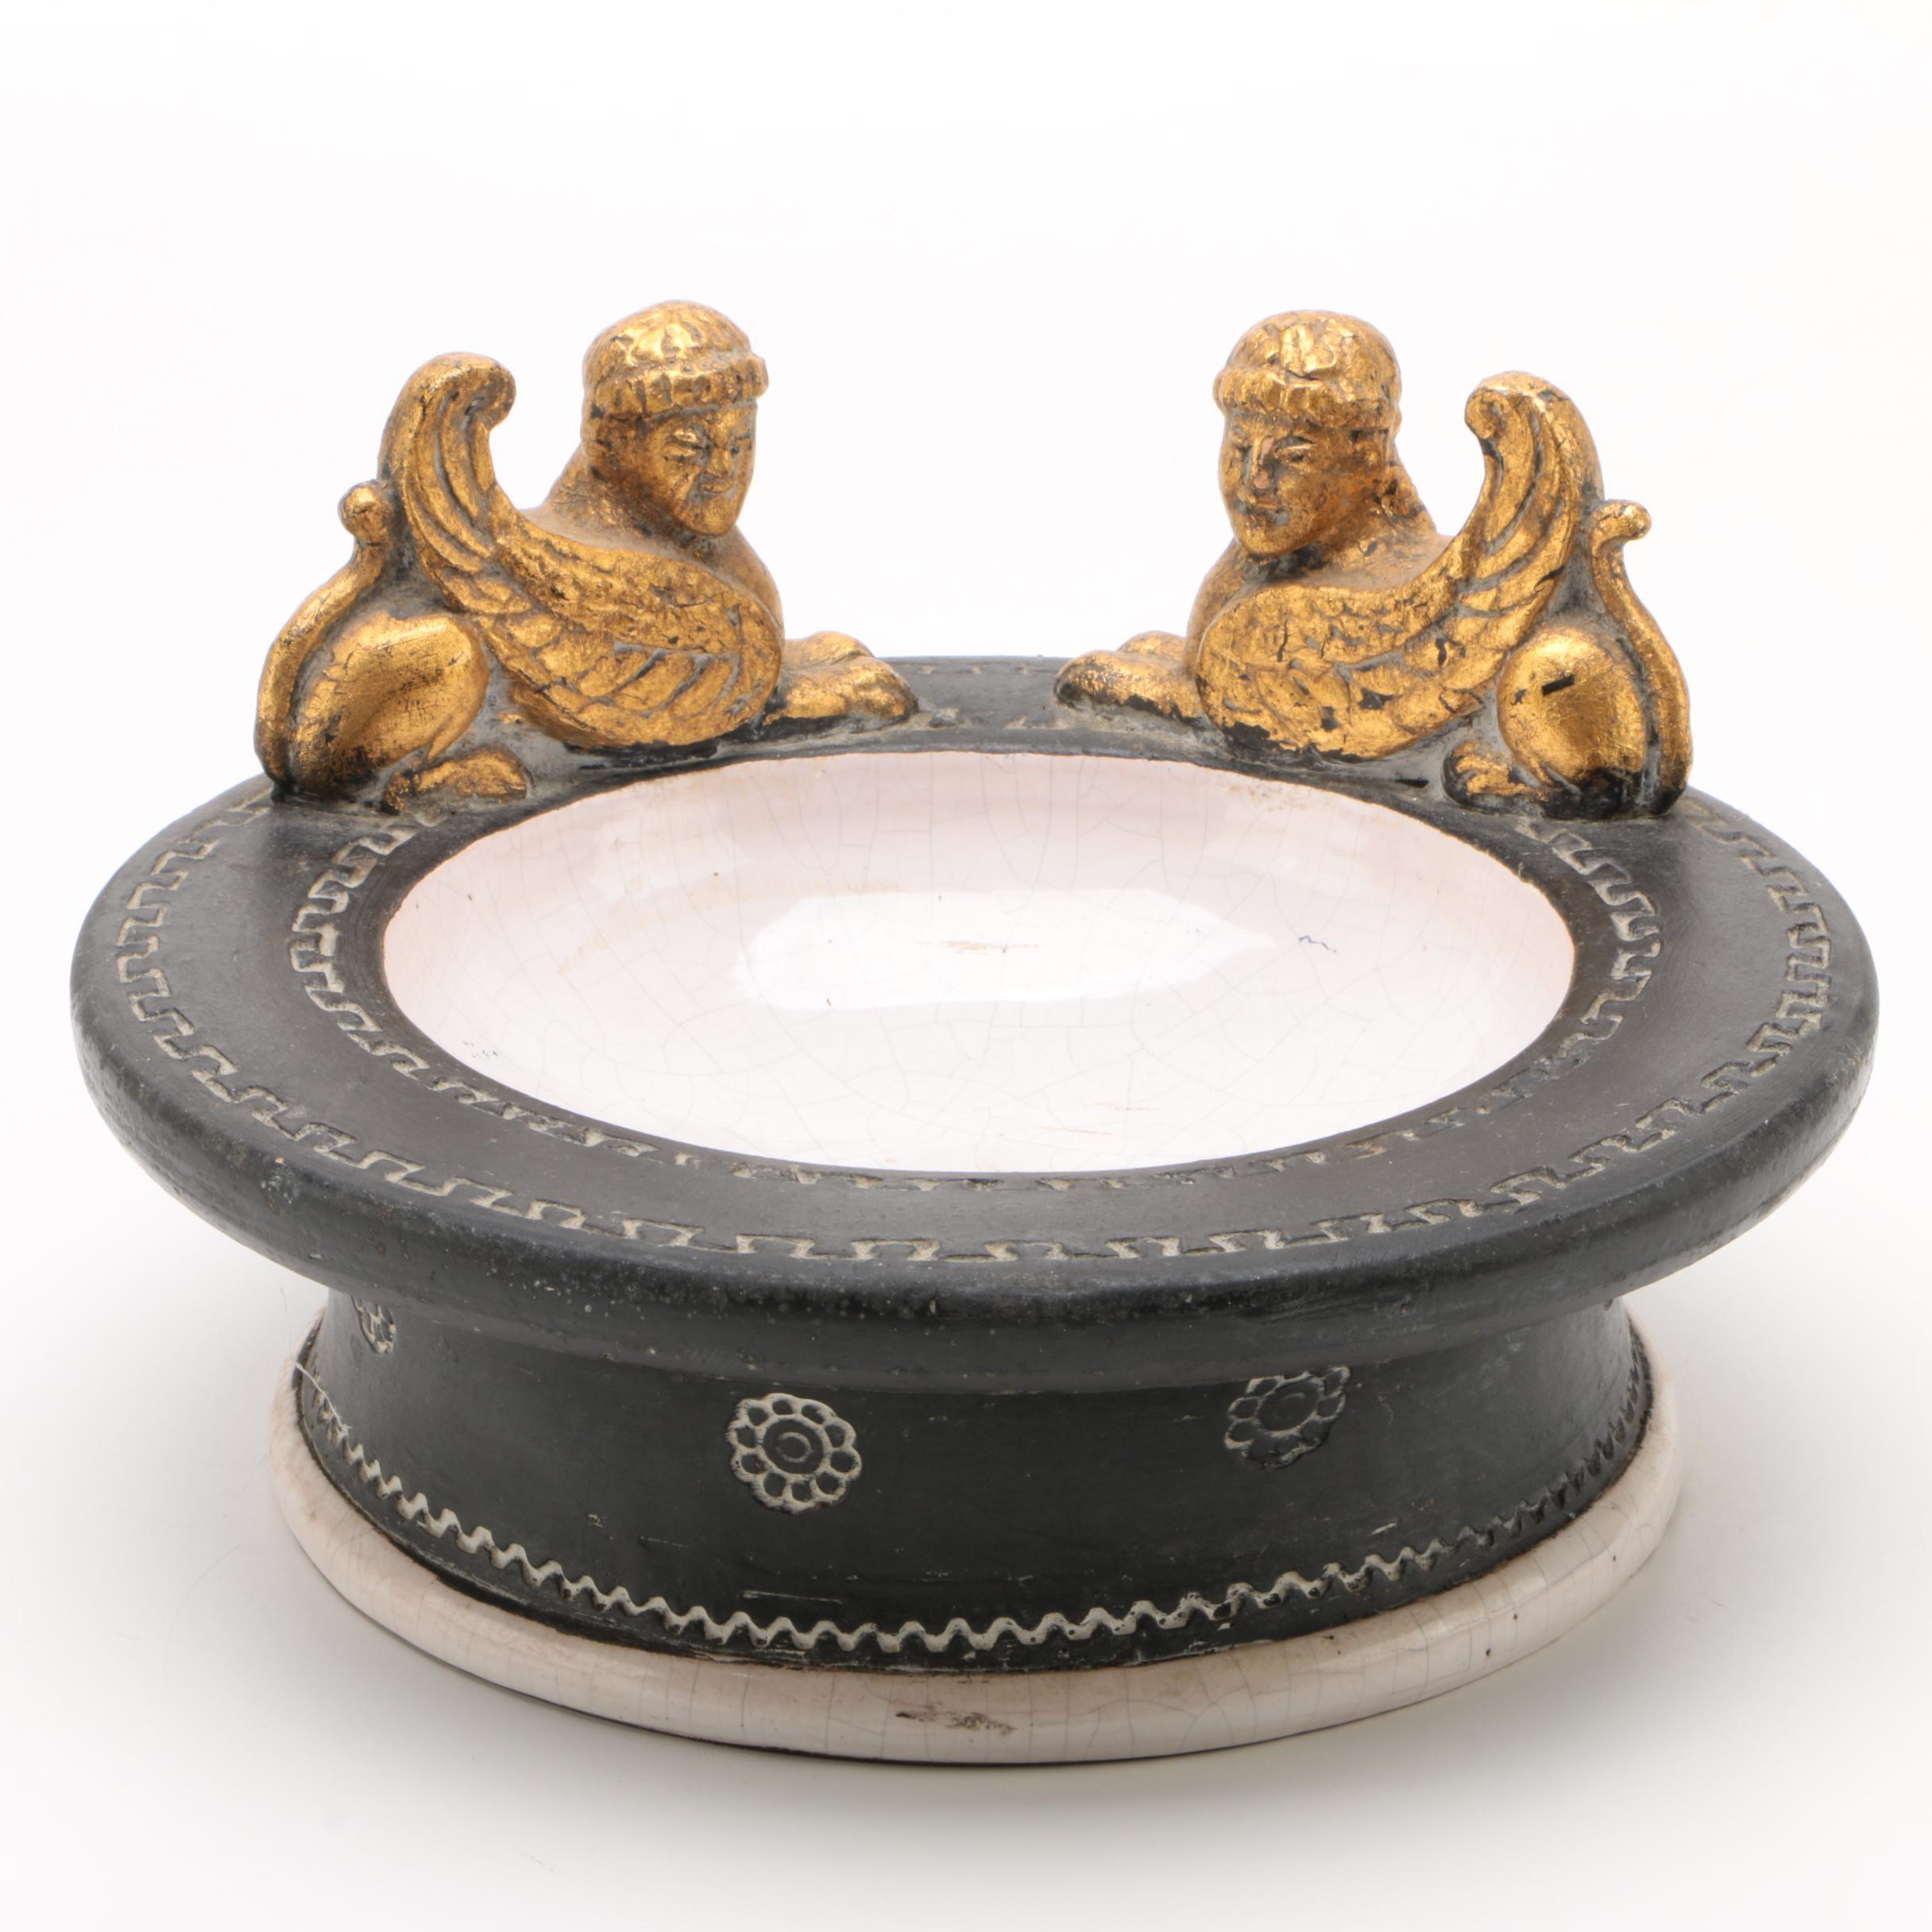 Egyptian Revival Ceramic Table Top Bird Bath